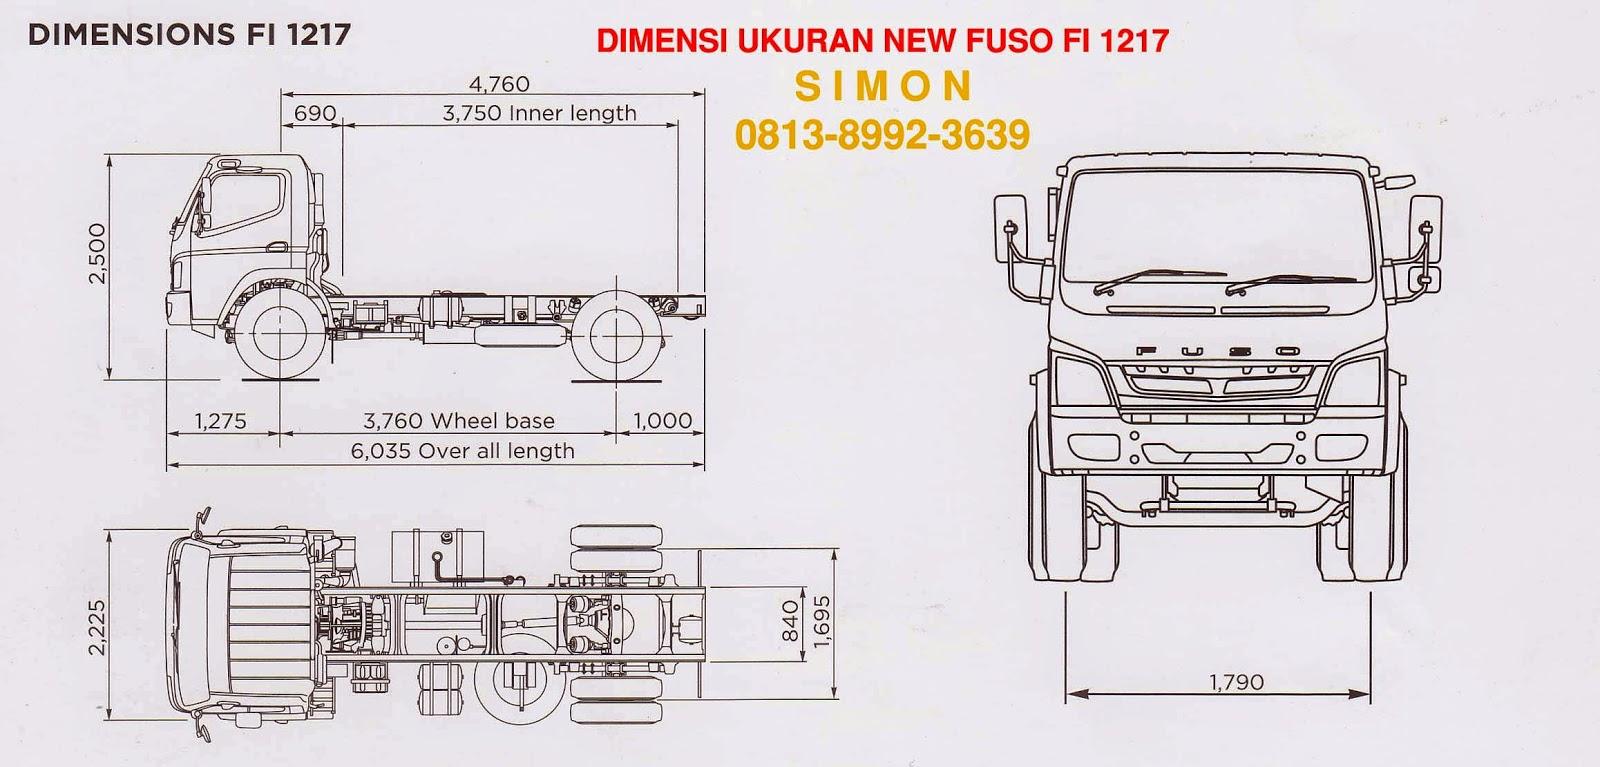 varian terbaru mitsubishi new fuso fi 1217 fuso 170 ps